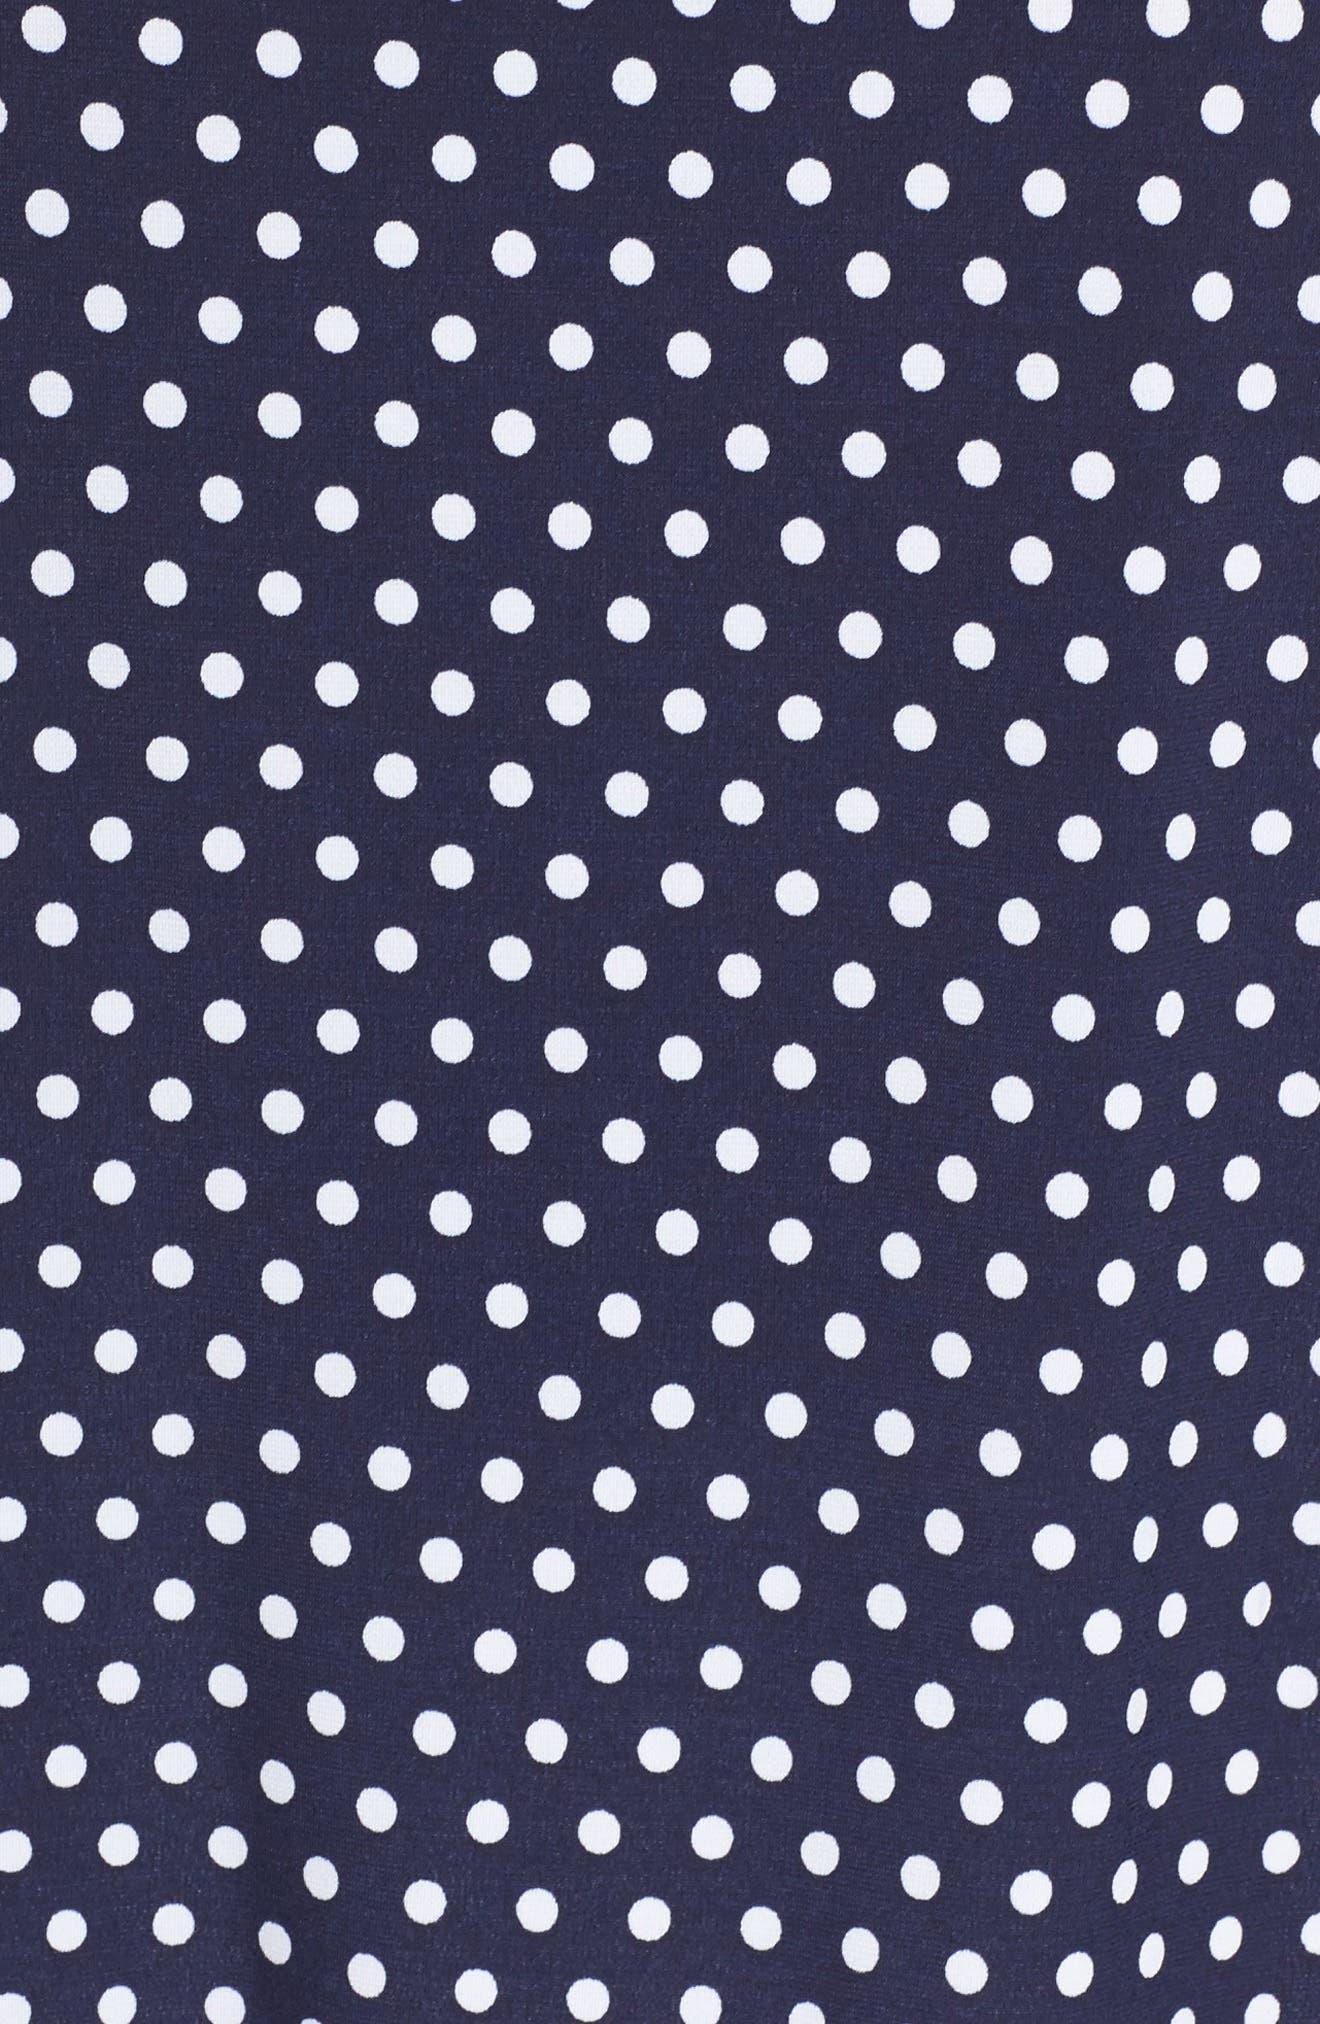 Simple Dot Peasant Top,                             Alternate thumbnail 5, color,                             True Navy/ White